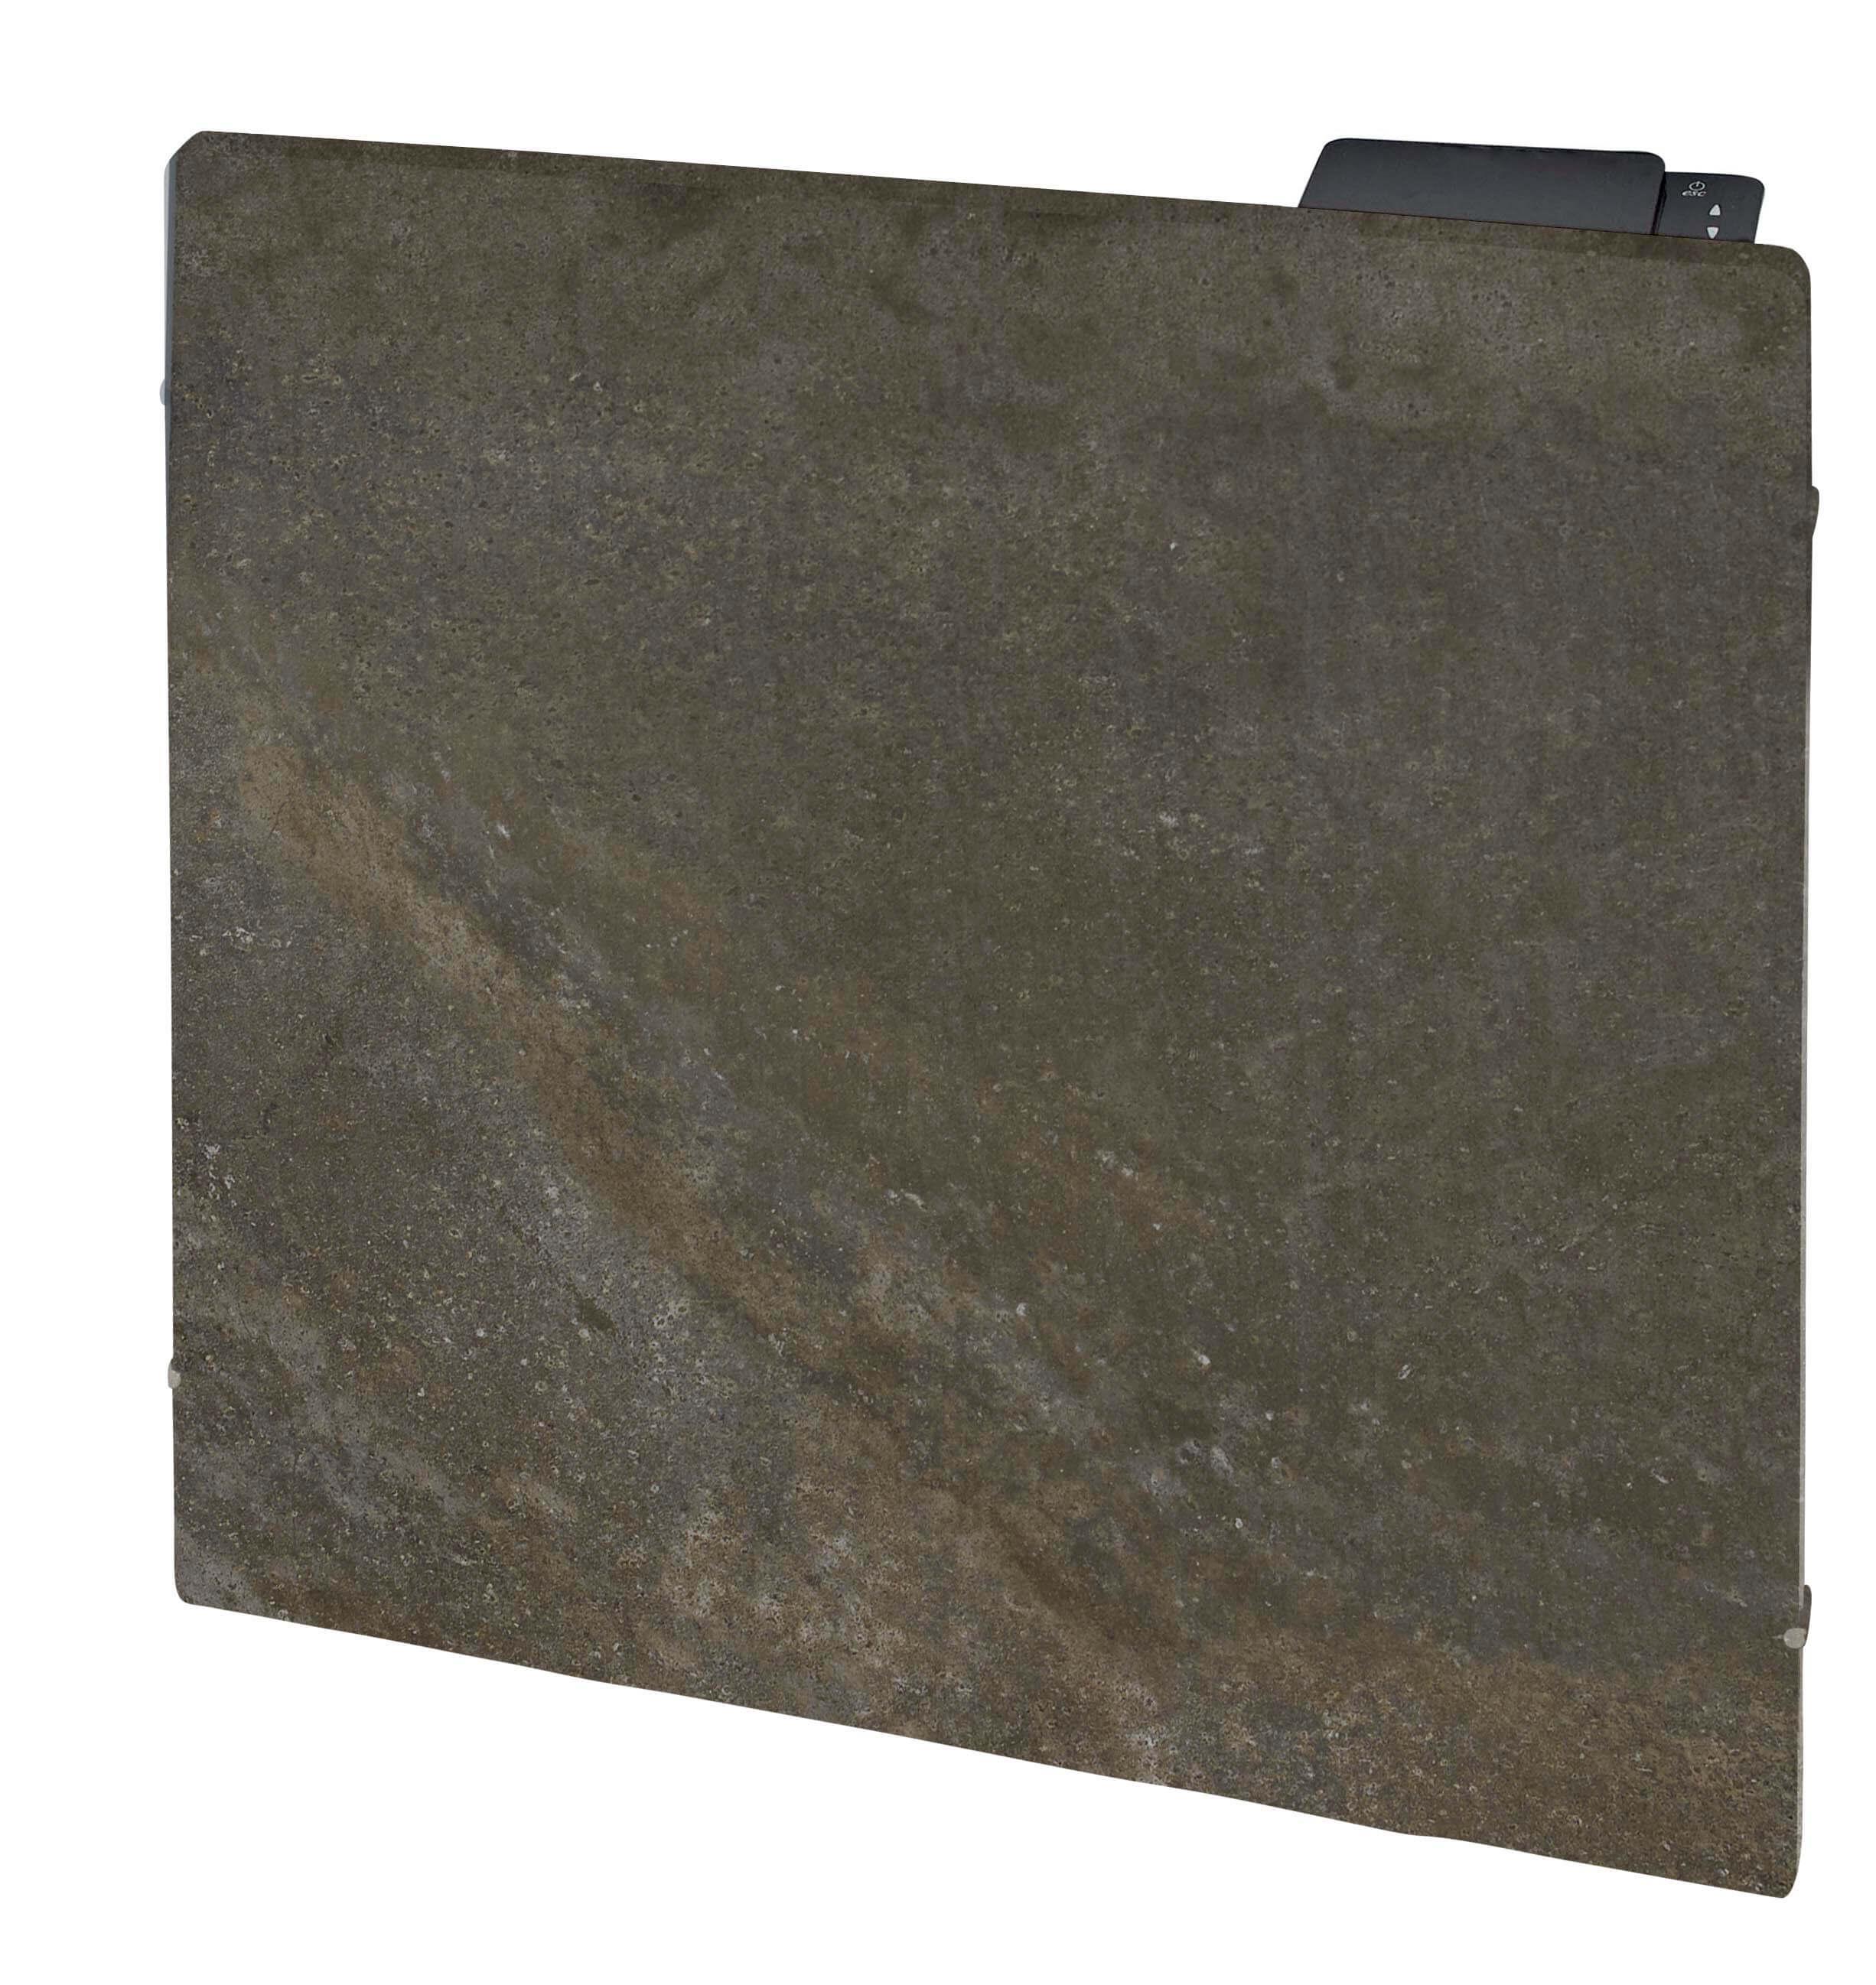 kalksteen tierra touch